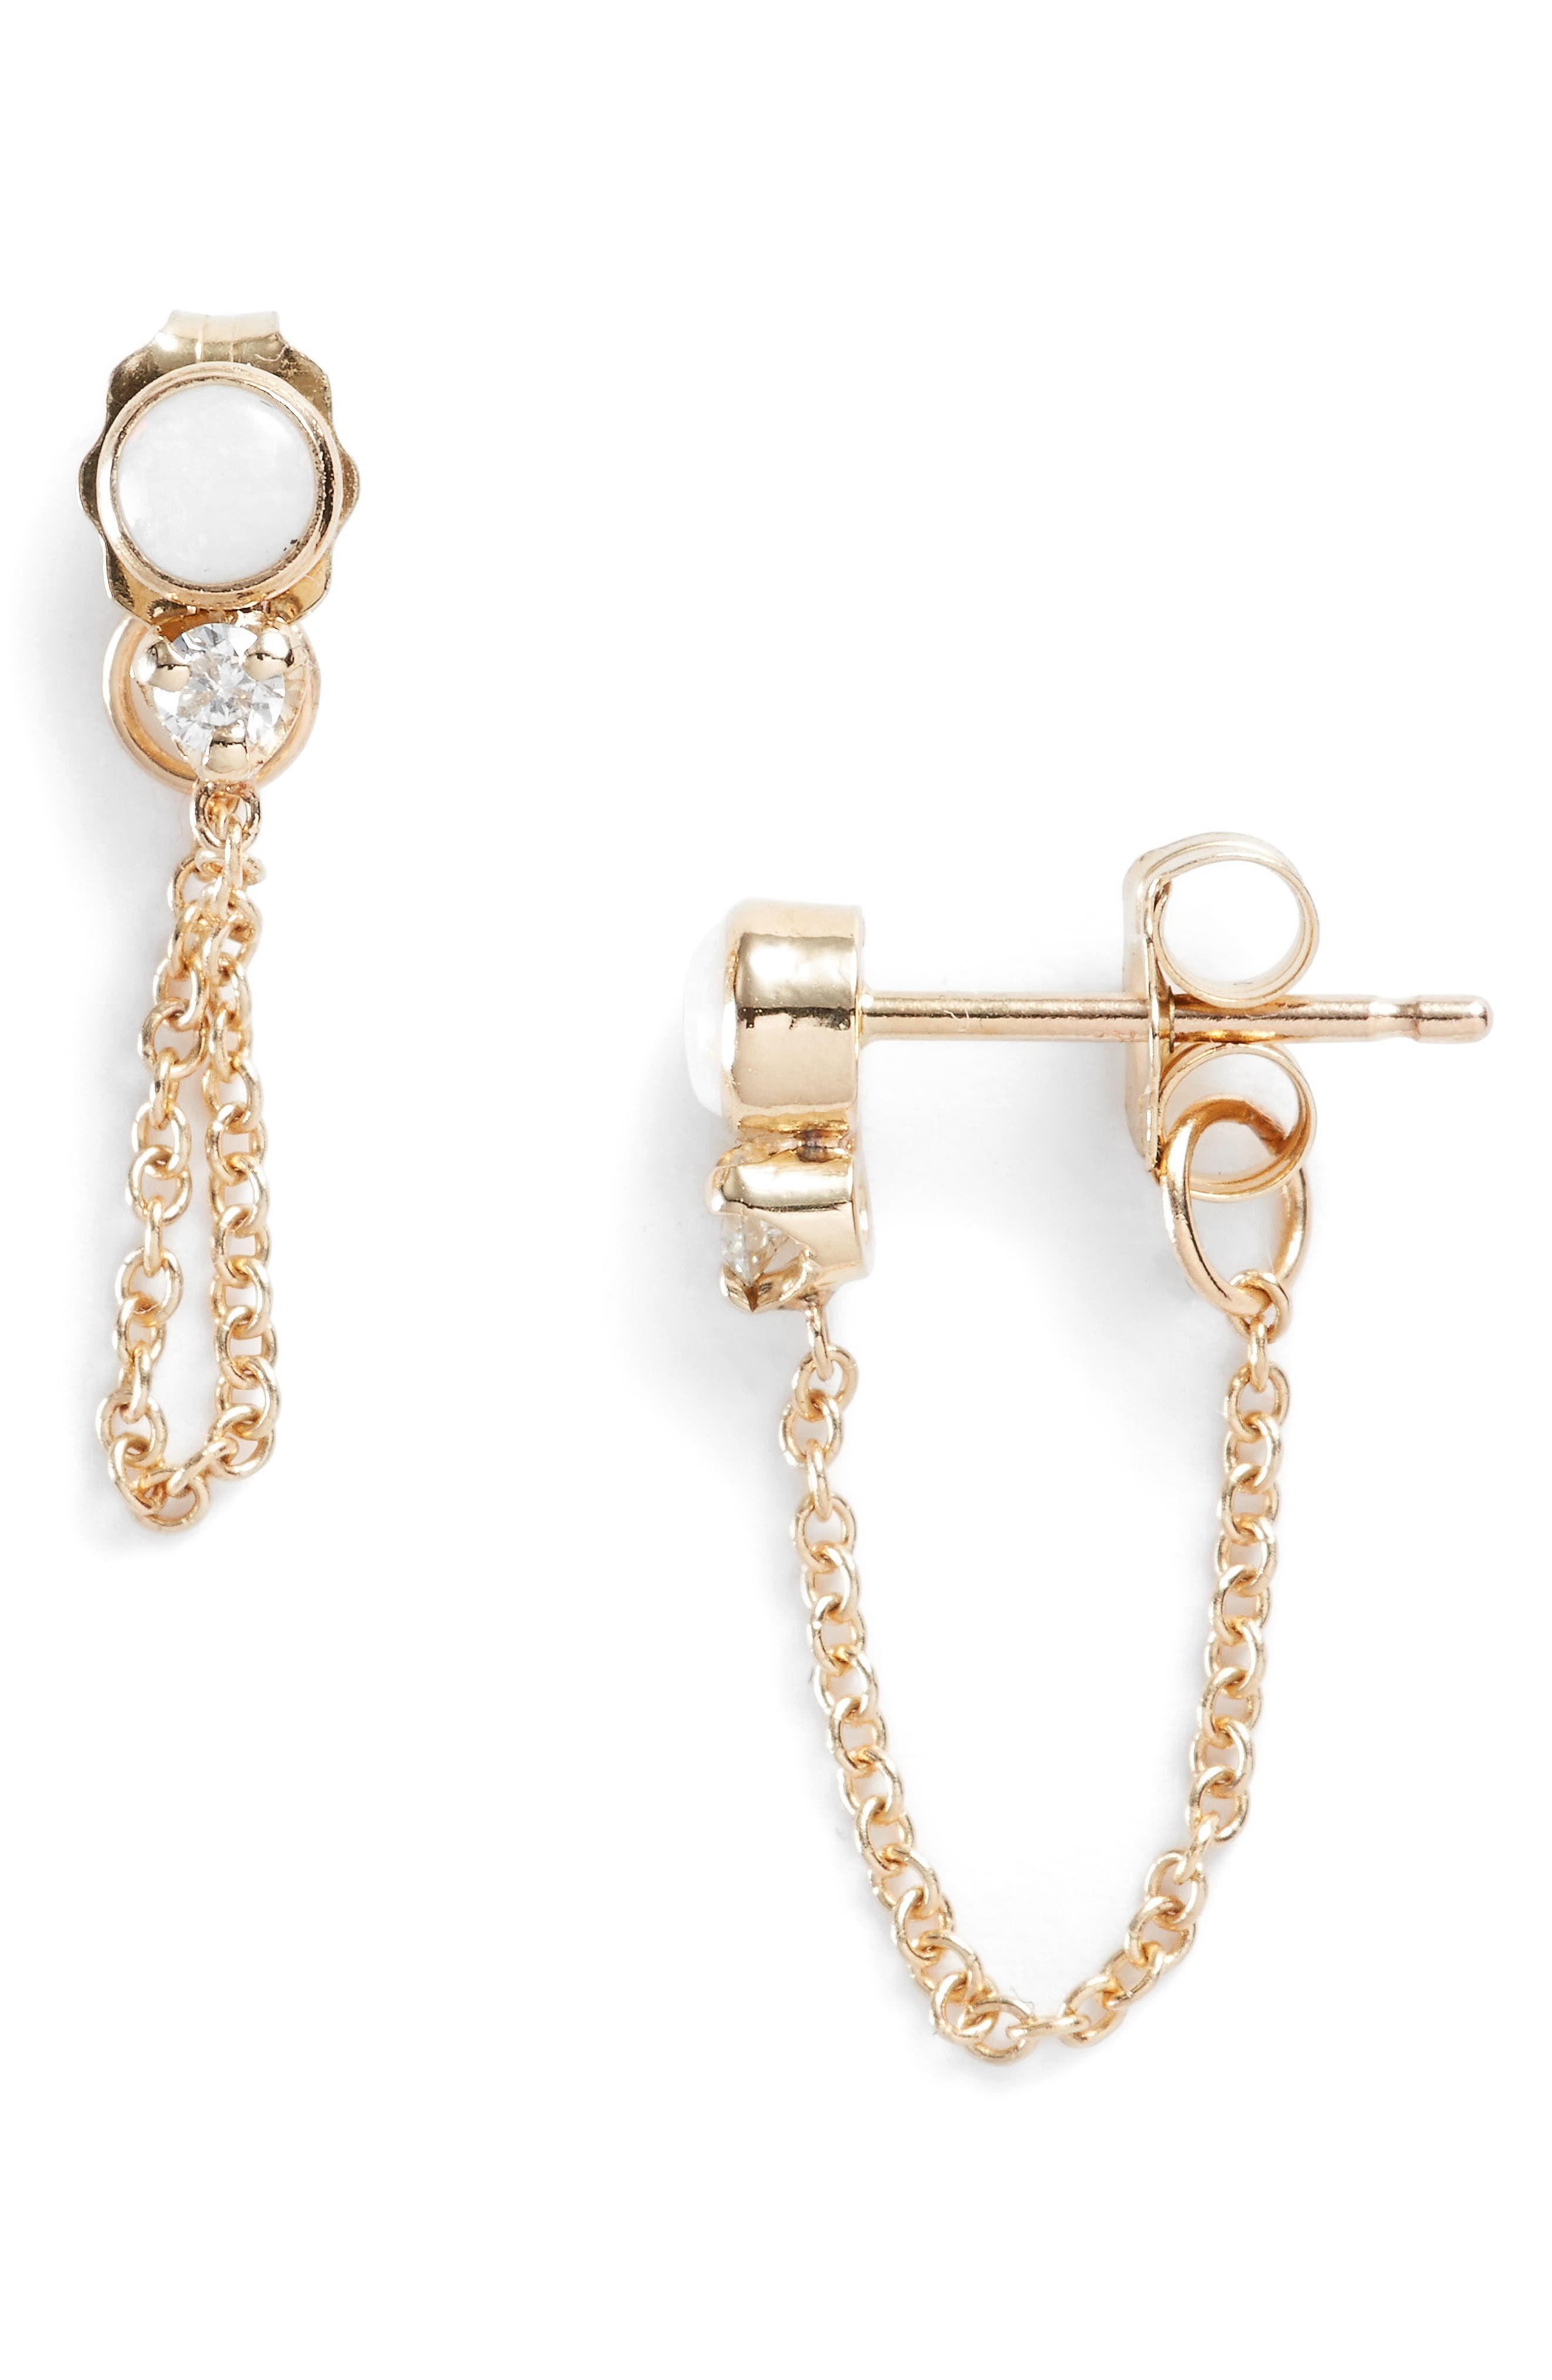 Diamond & Opal Front Back Earrings,                             Main thumbnail 1, color,                             Yellow Gold/ Opal